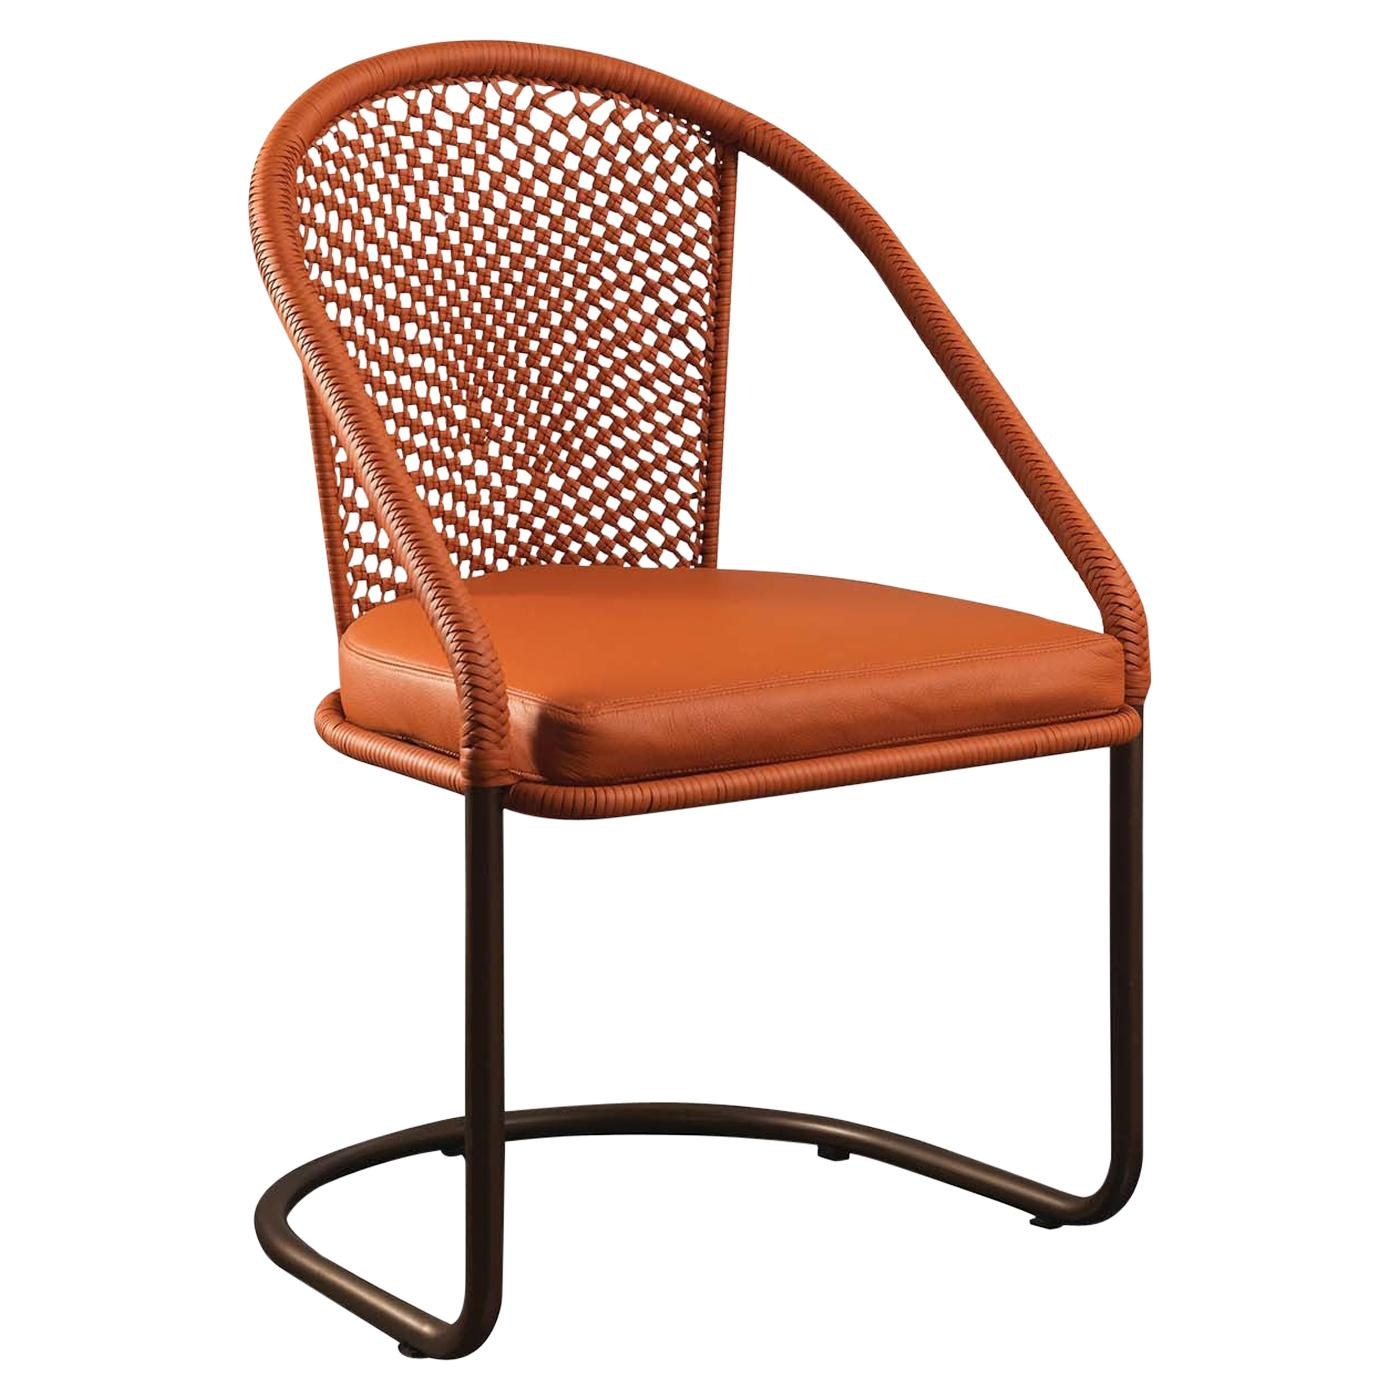 Domino Chair by Officina Ciani & Ciarmoli Queda Studio